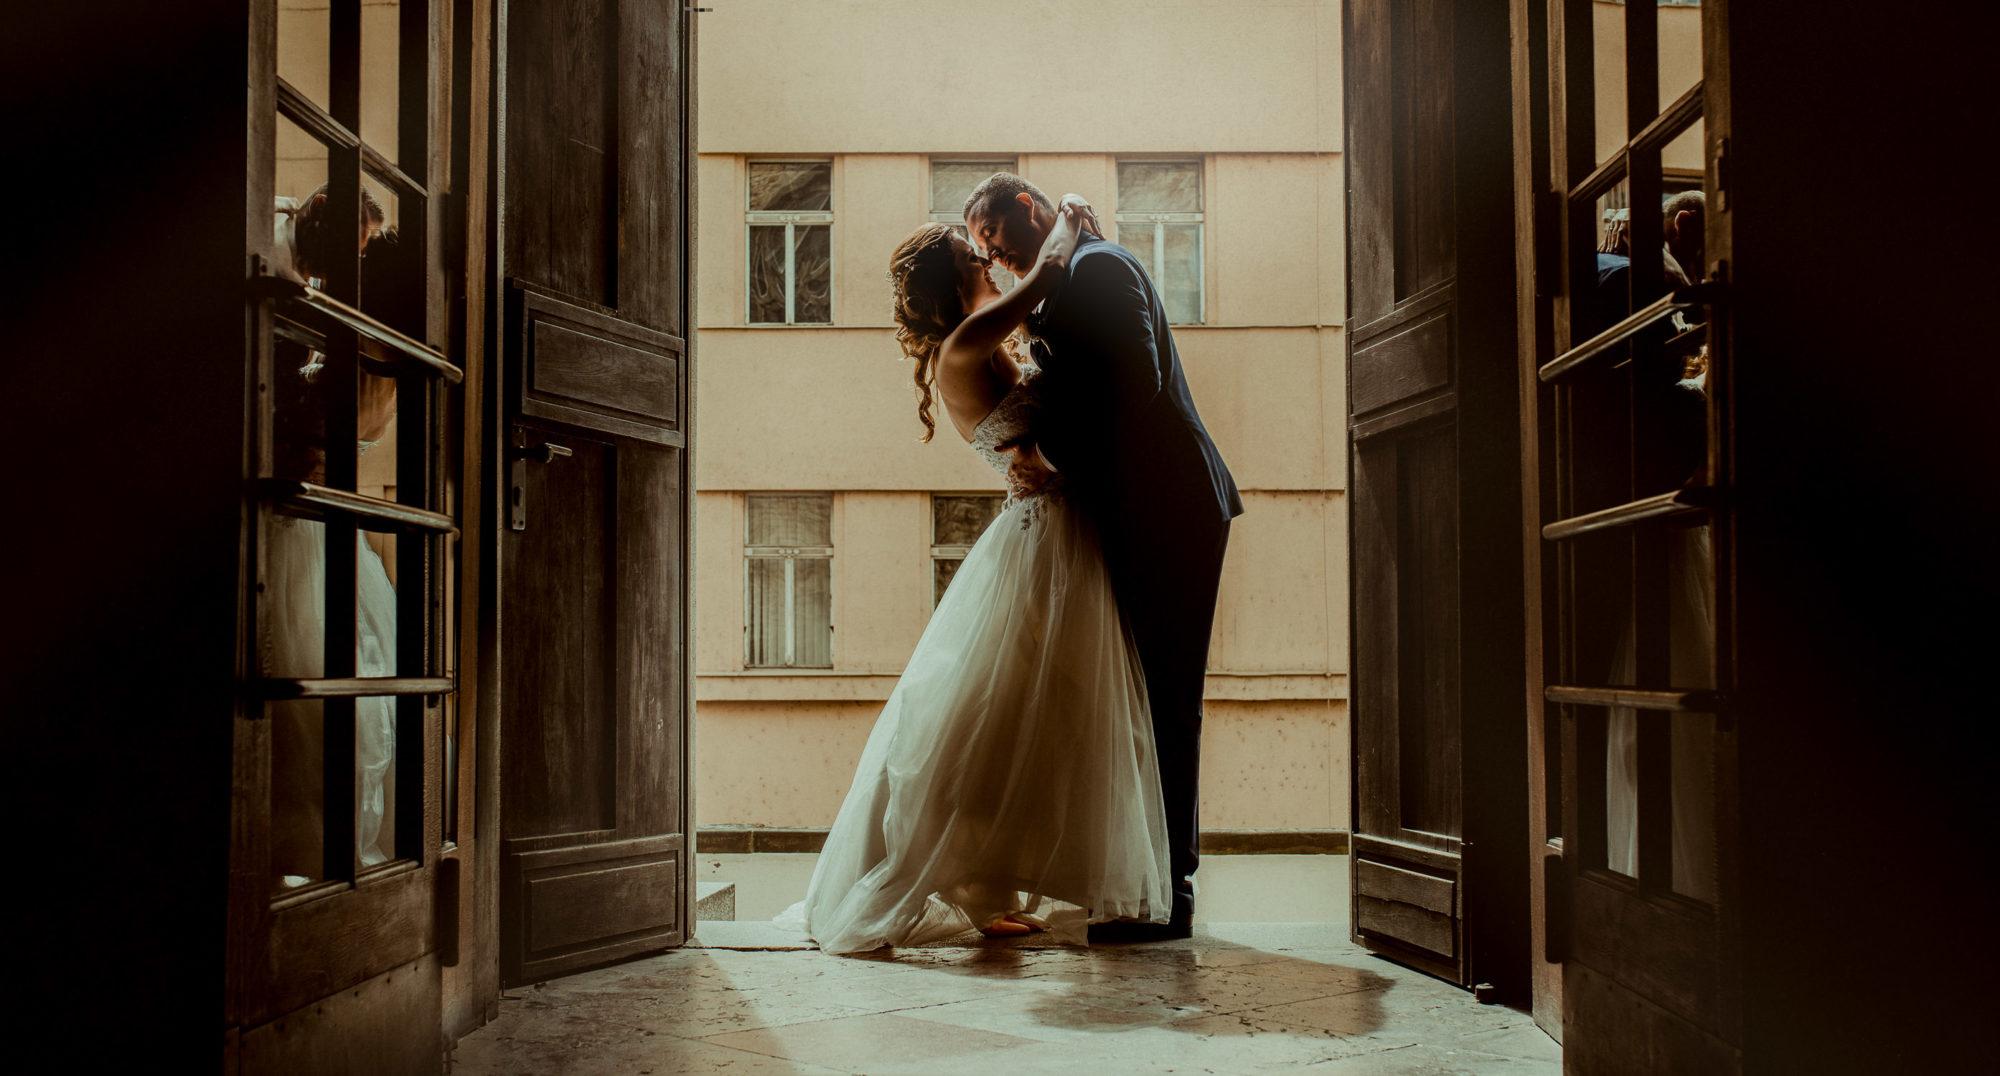 Prague-wedding-couple-in-a-church-hugging